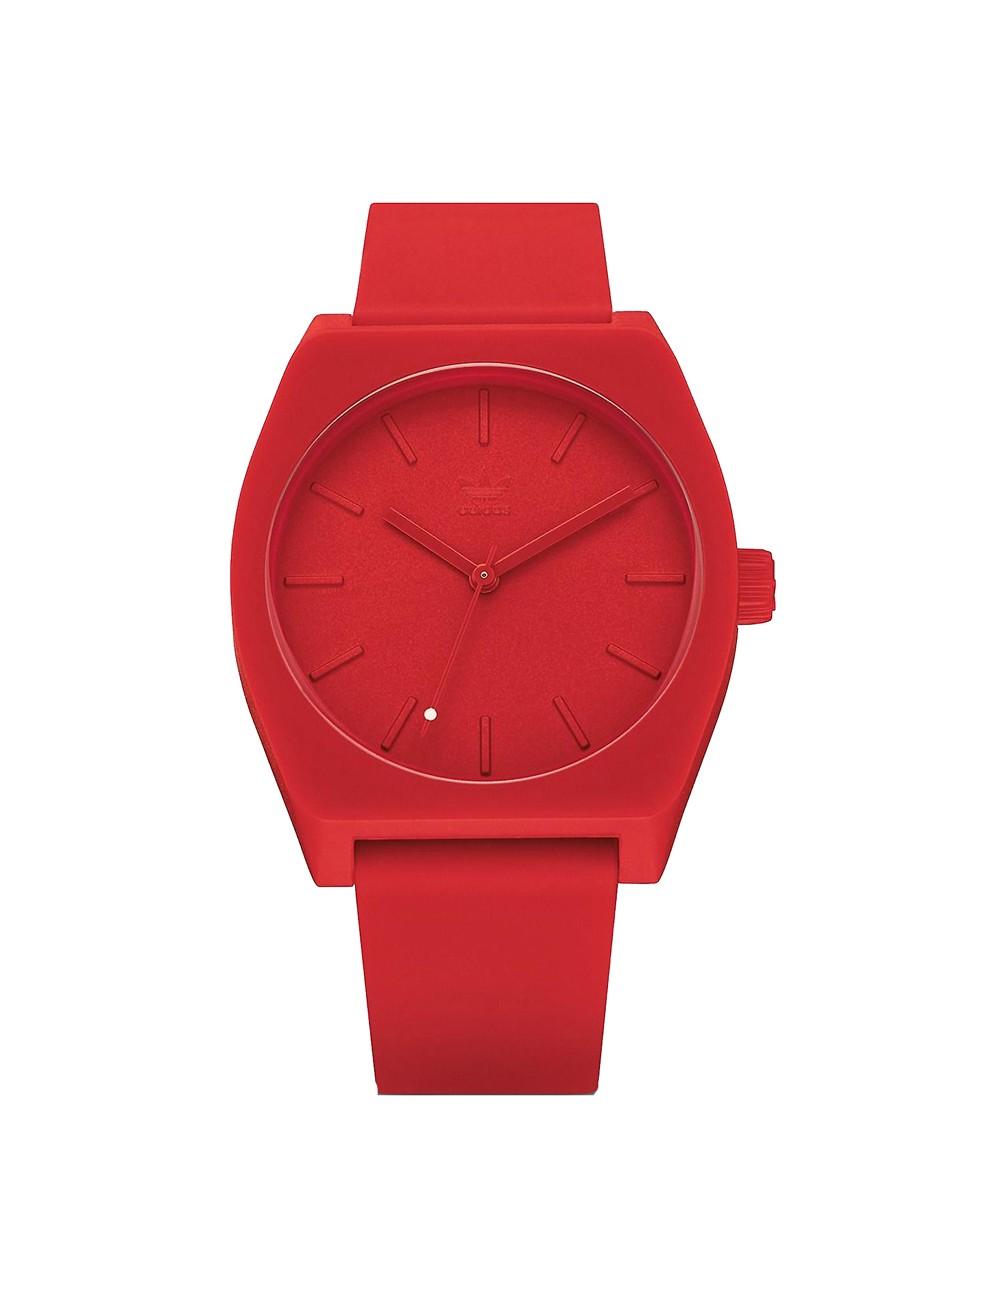 Pánske hodinky Adidas Process SP1 Z10191